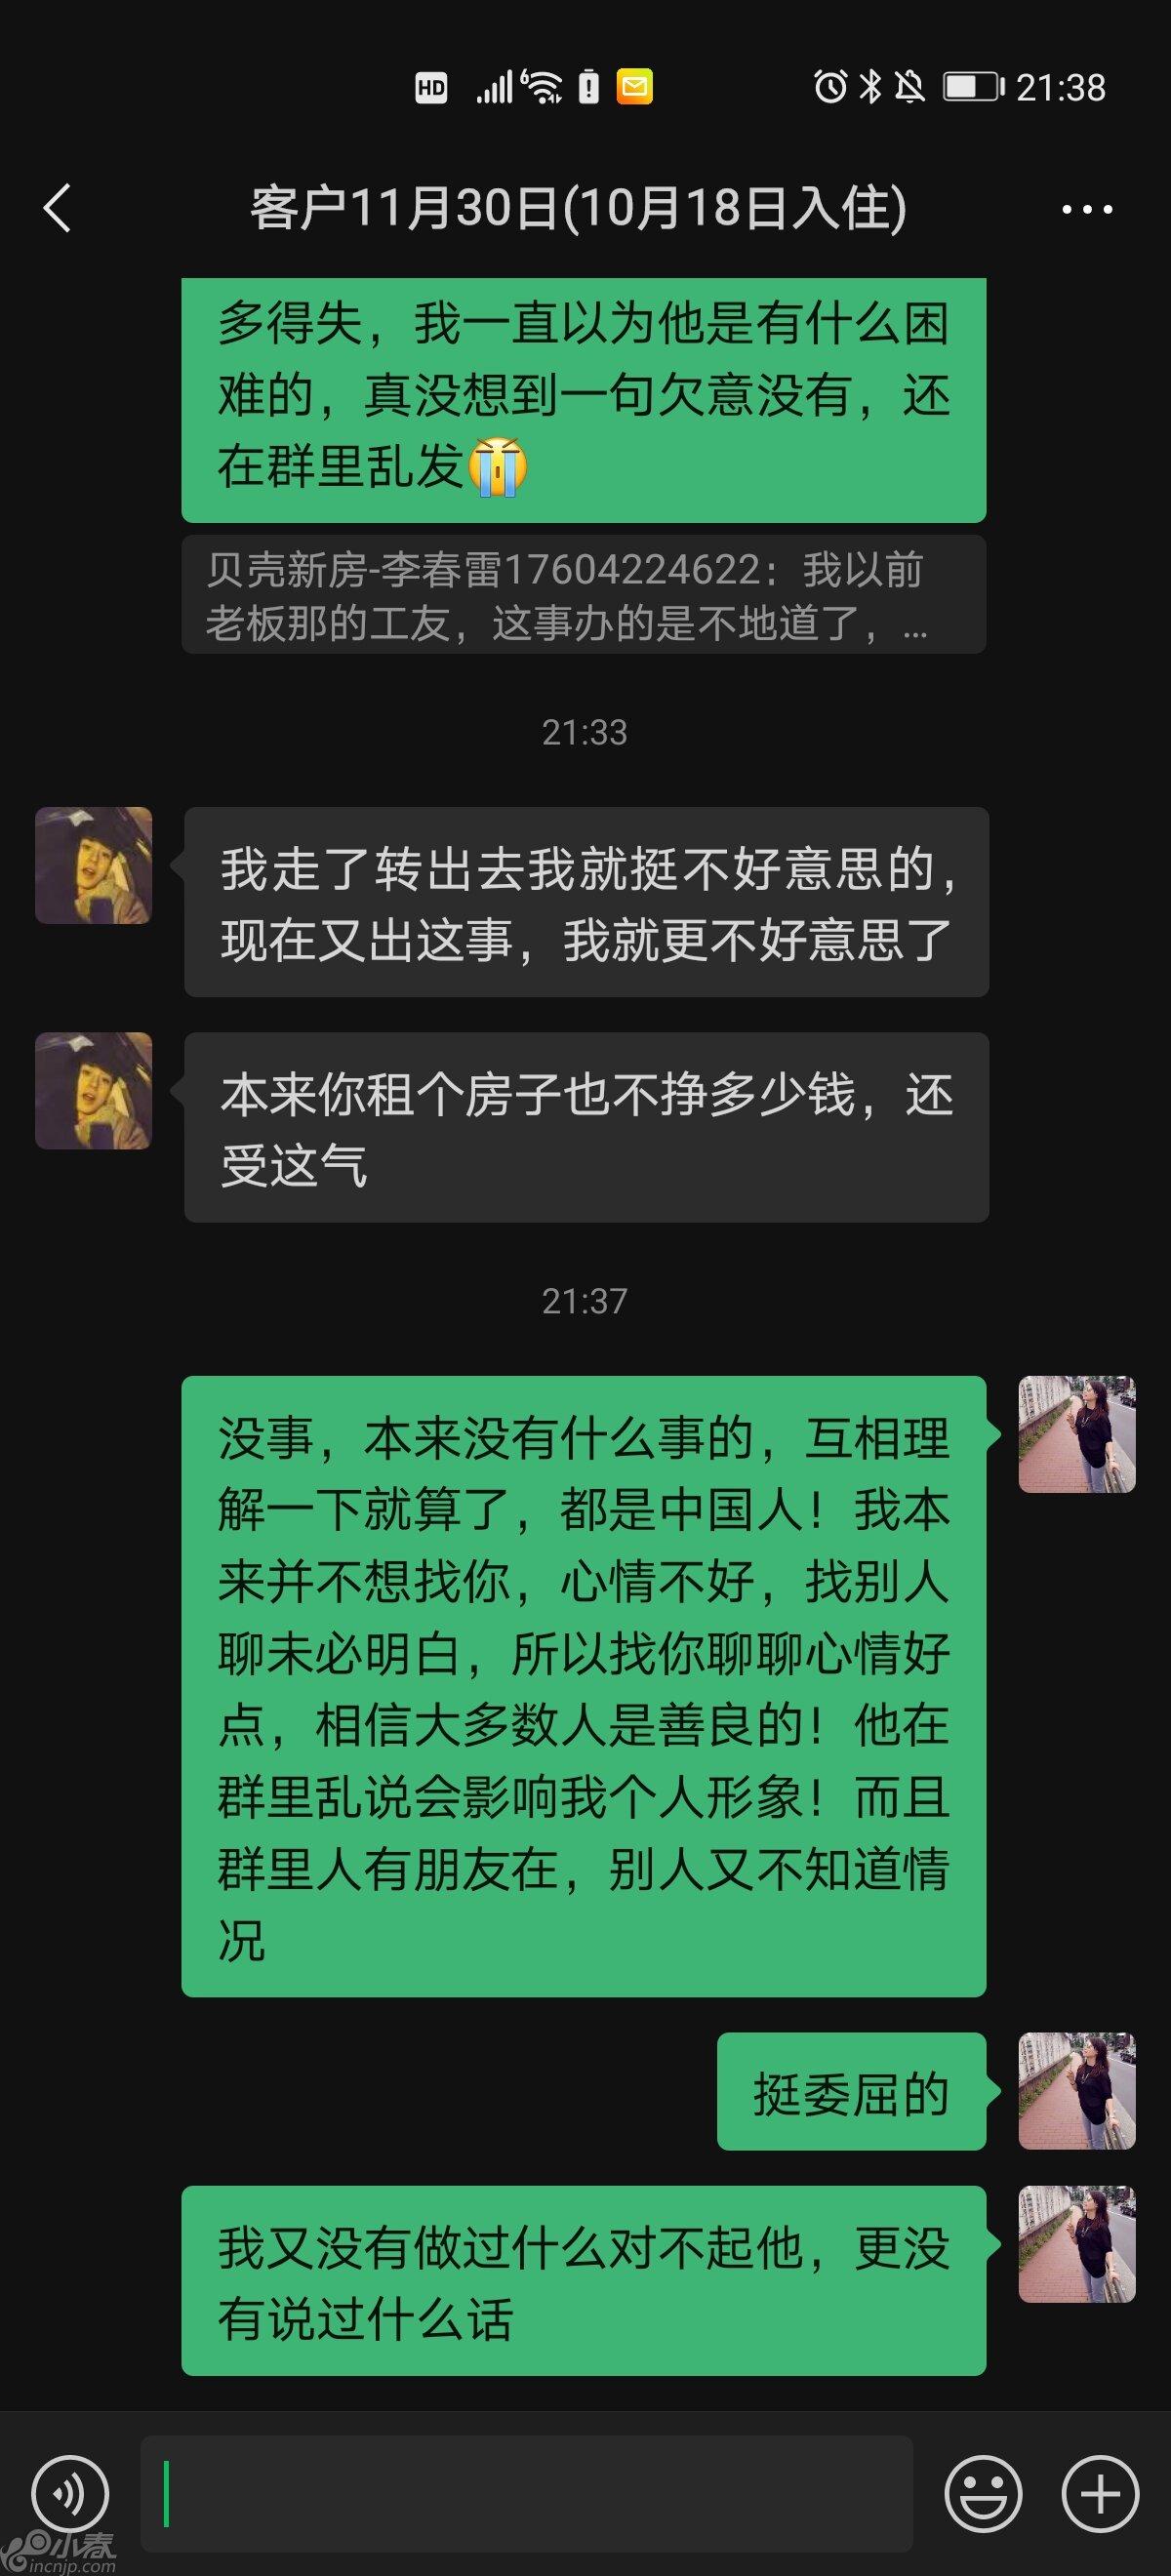 Screenshot_20210721_213834_com.tencent.mm.jpg